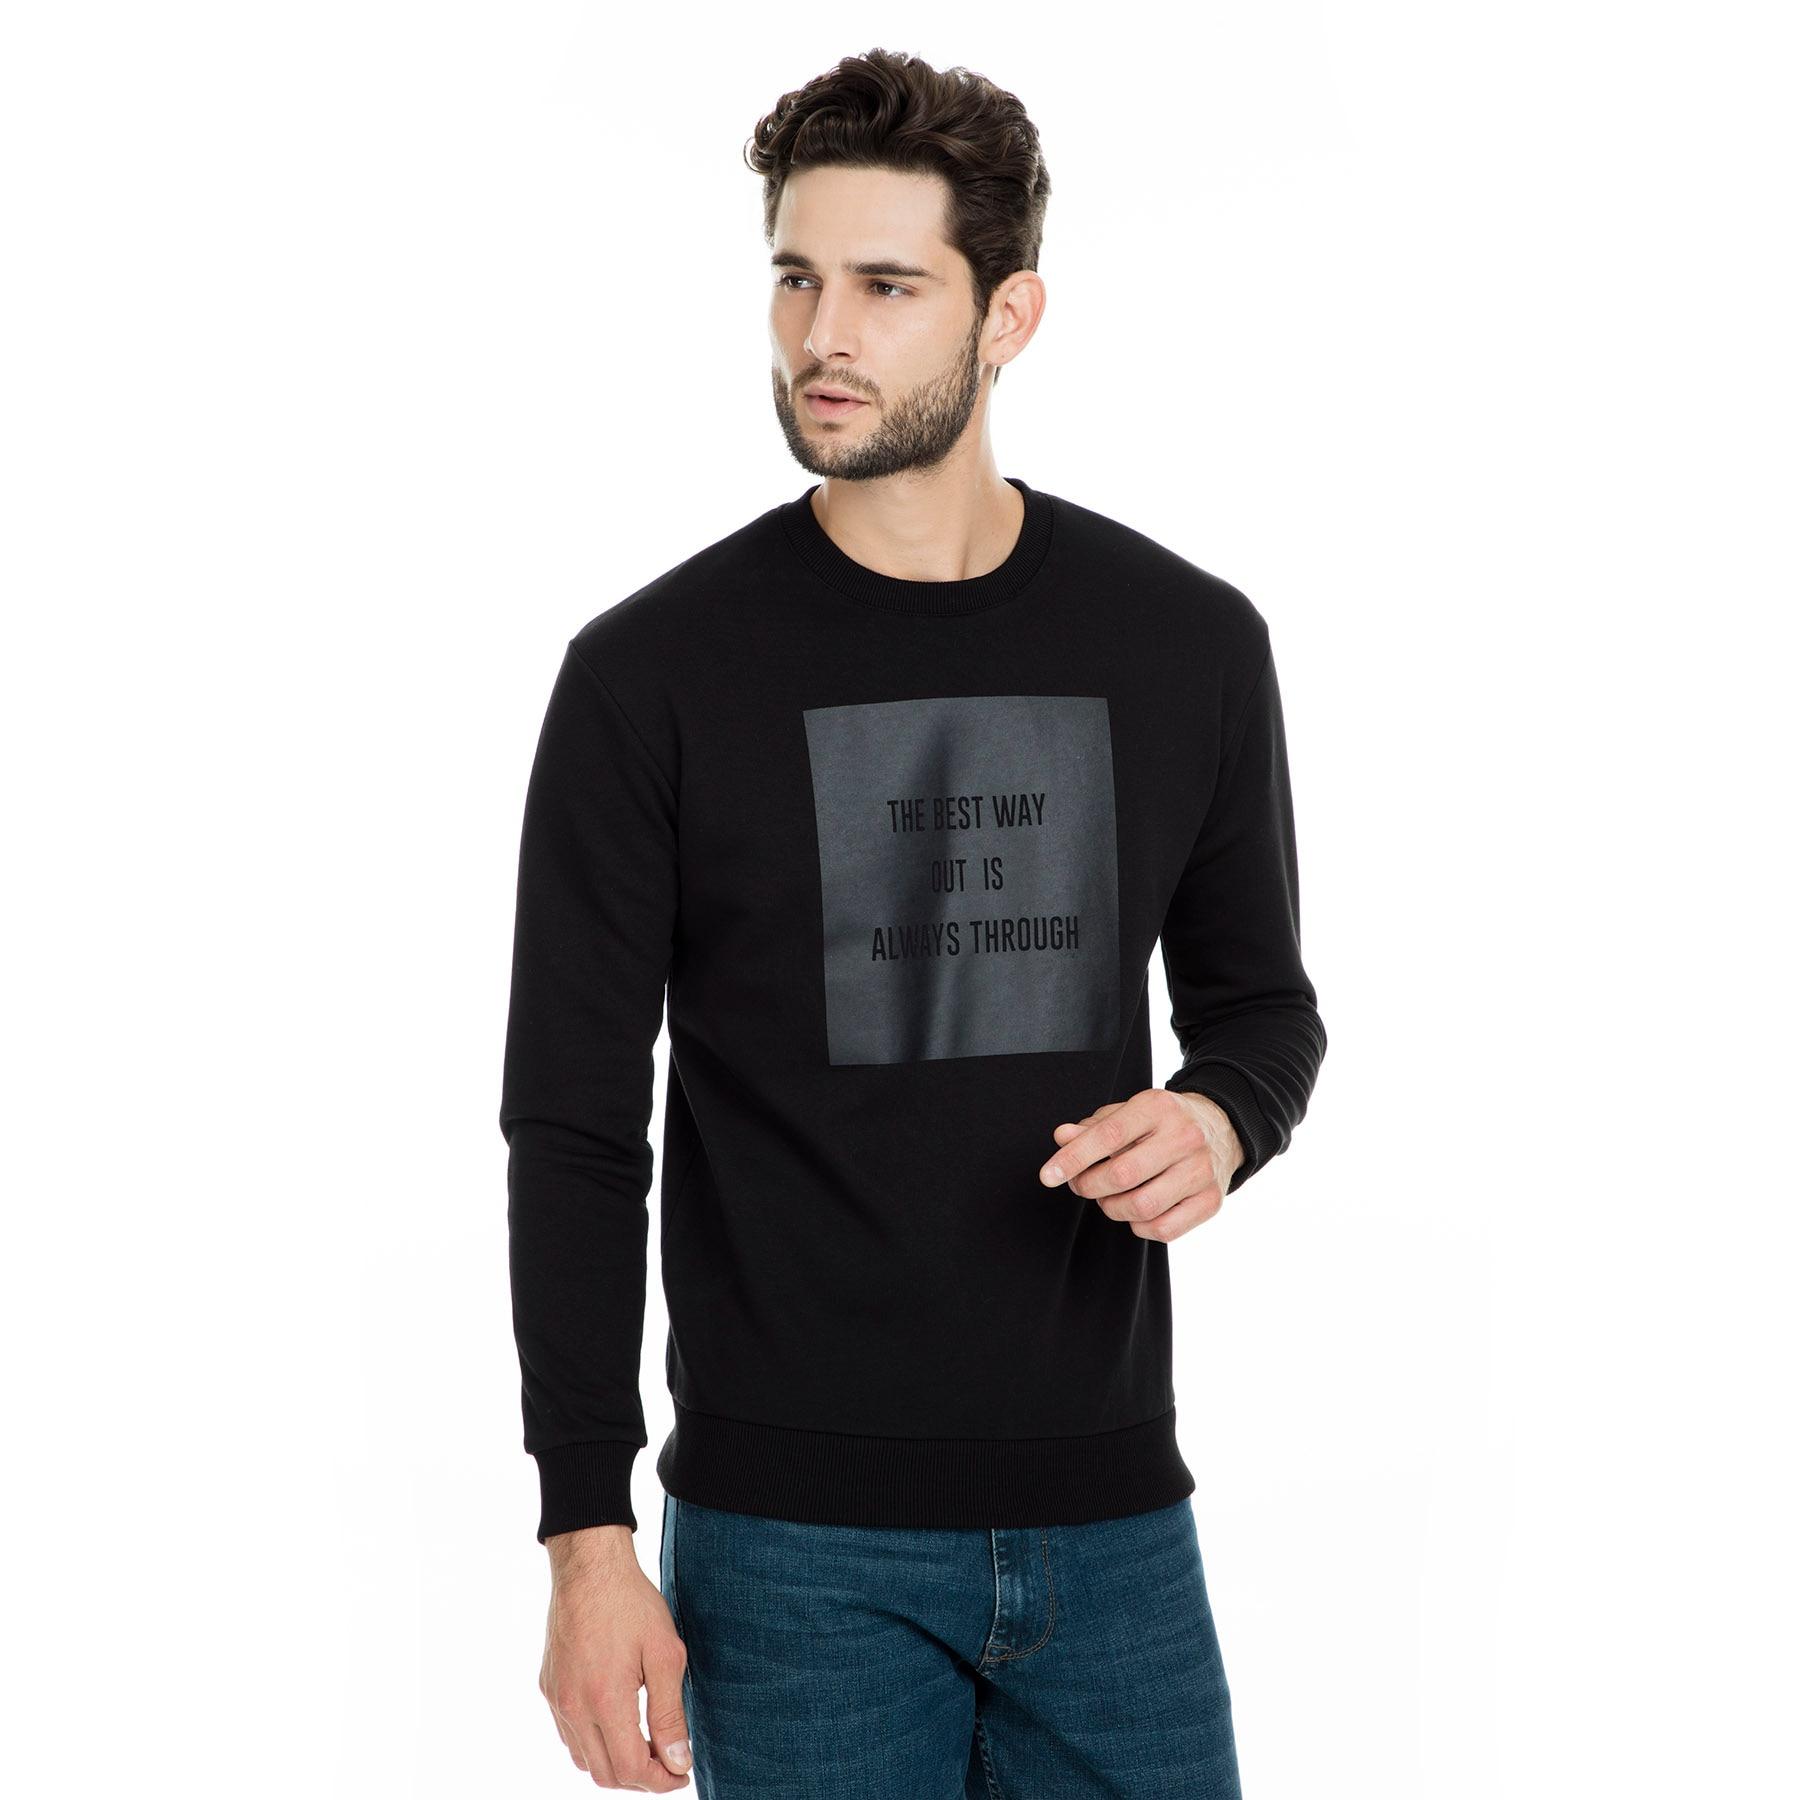 Buratti Sport Printed Sweat Long Sleeve Male Sweat Autumn Sweatshirt Fashion Men's Clothing Casual Sweathirts 0434107